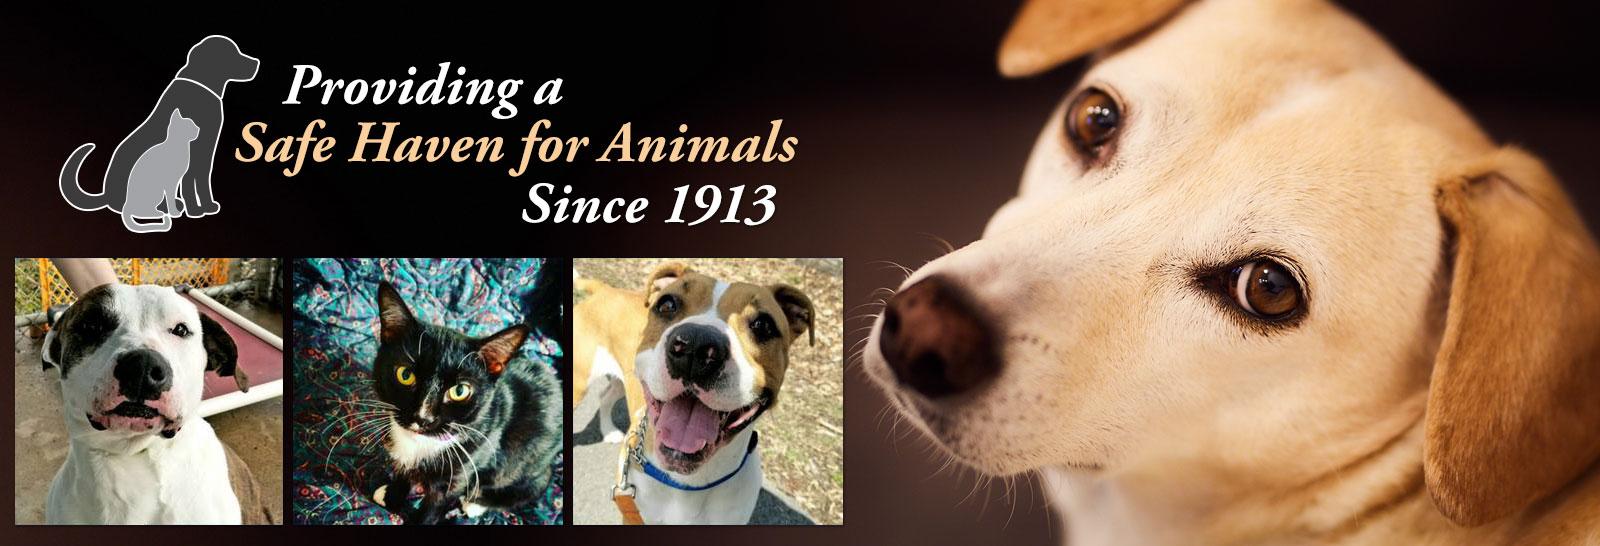 Home - Herkimer County Humane Society